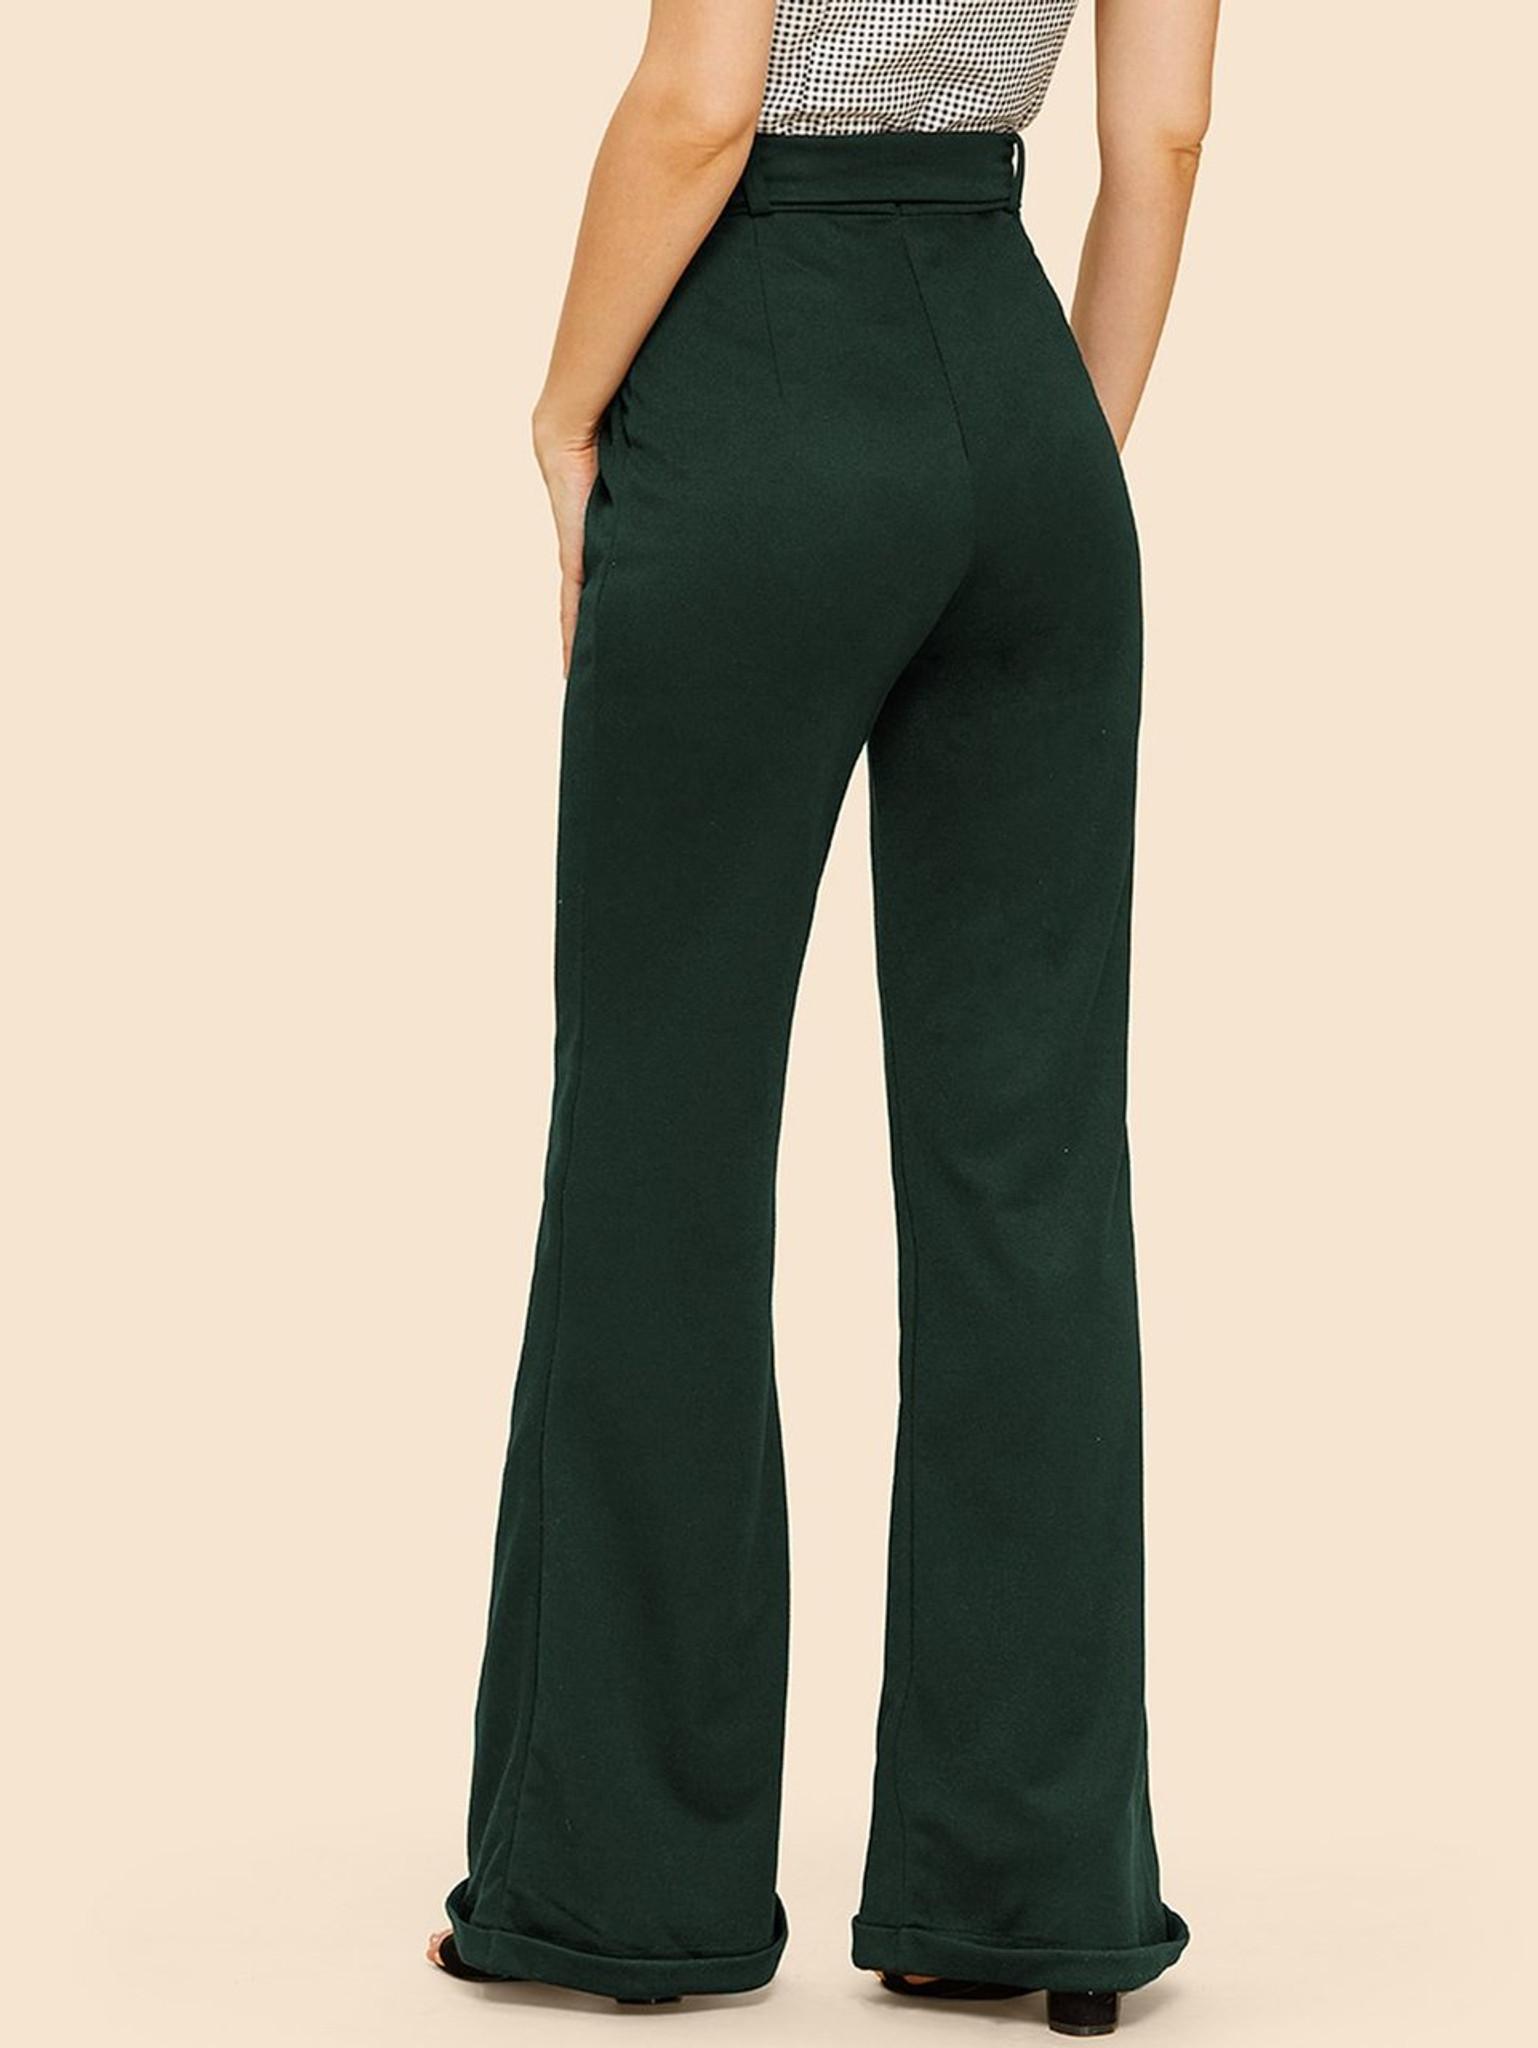 Fifth Avenue Womens NIXX Flare Cuffed Wide Leg Pants - Green